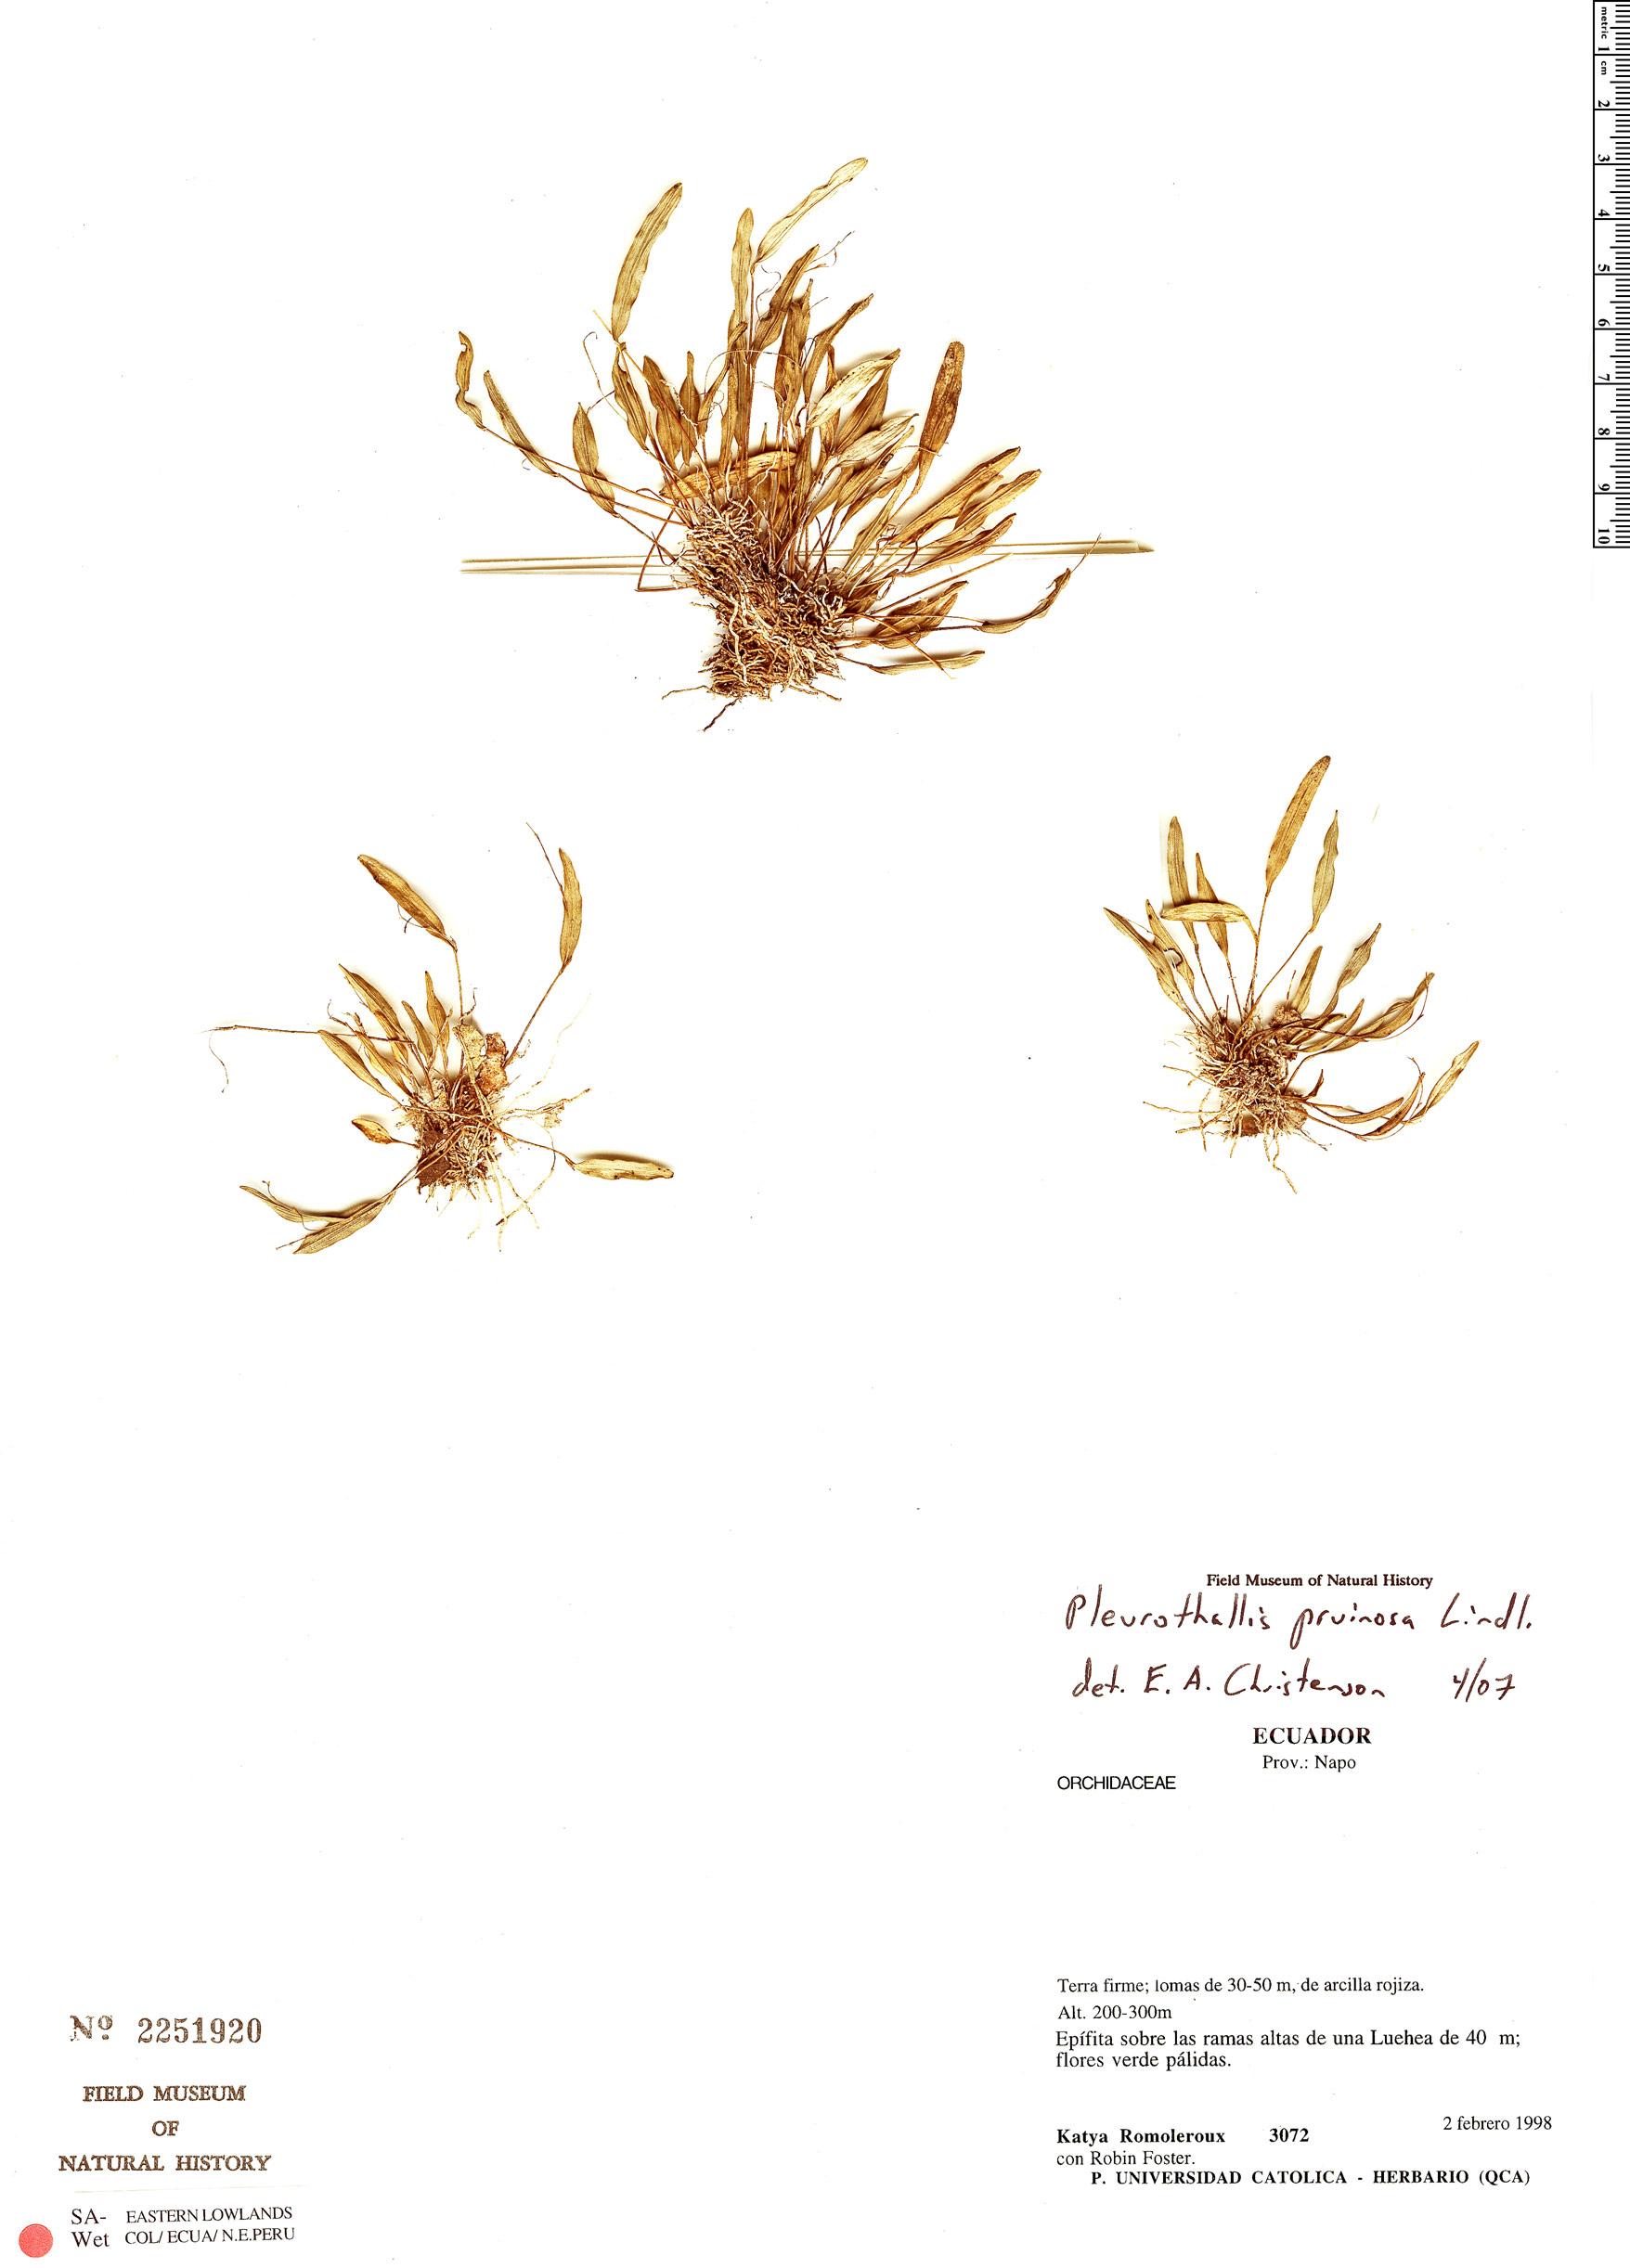 Specimen: Pleurothallis pruinosa